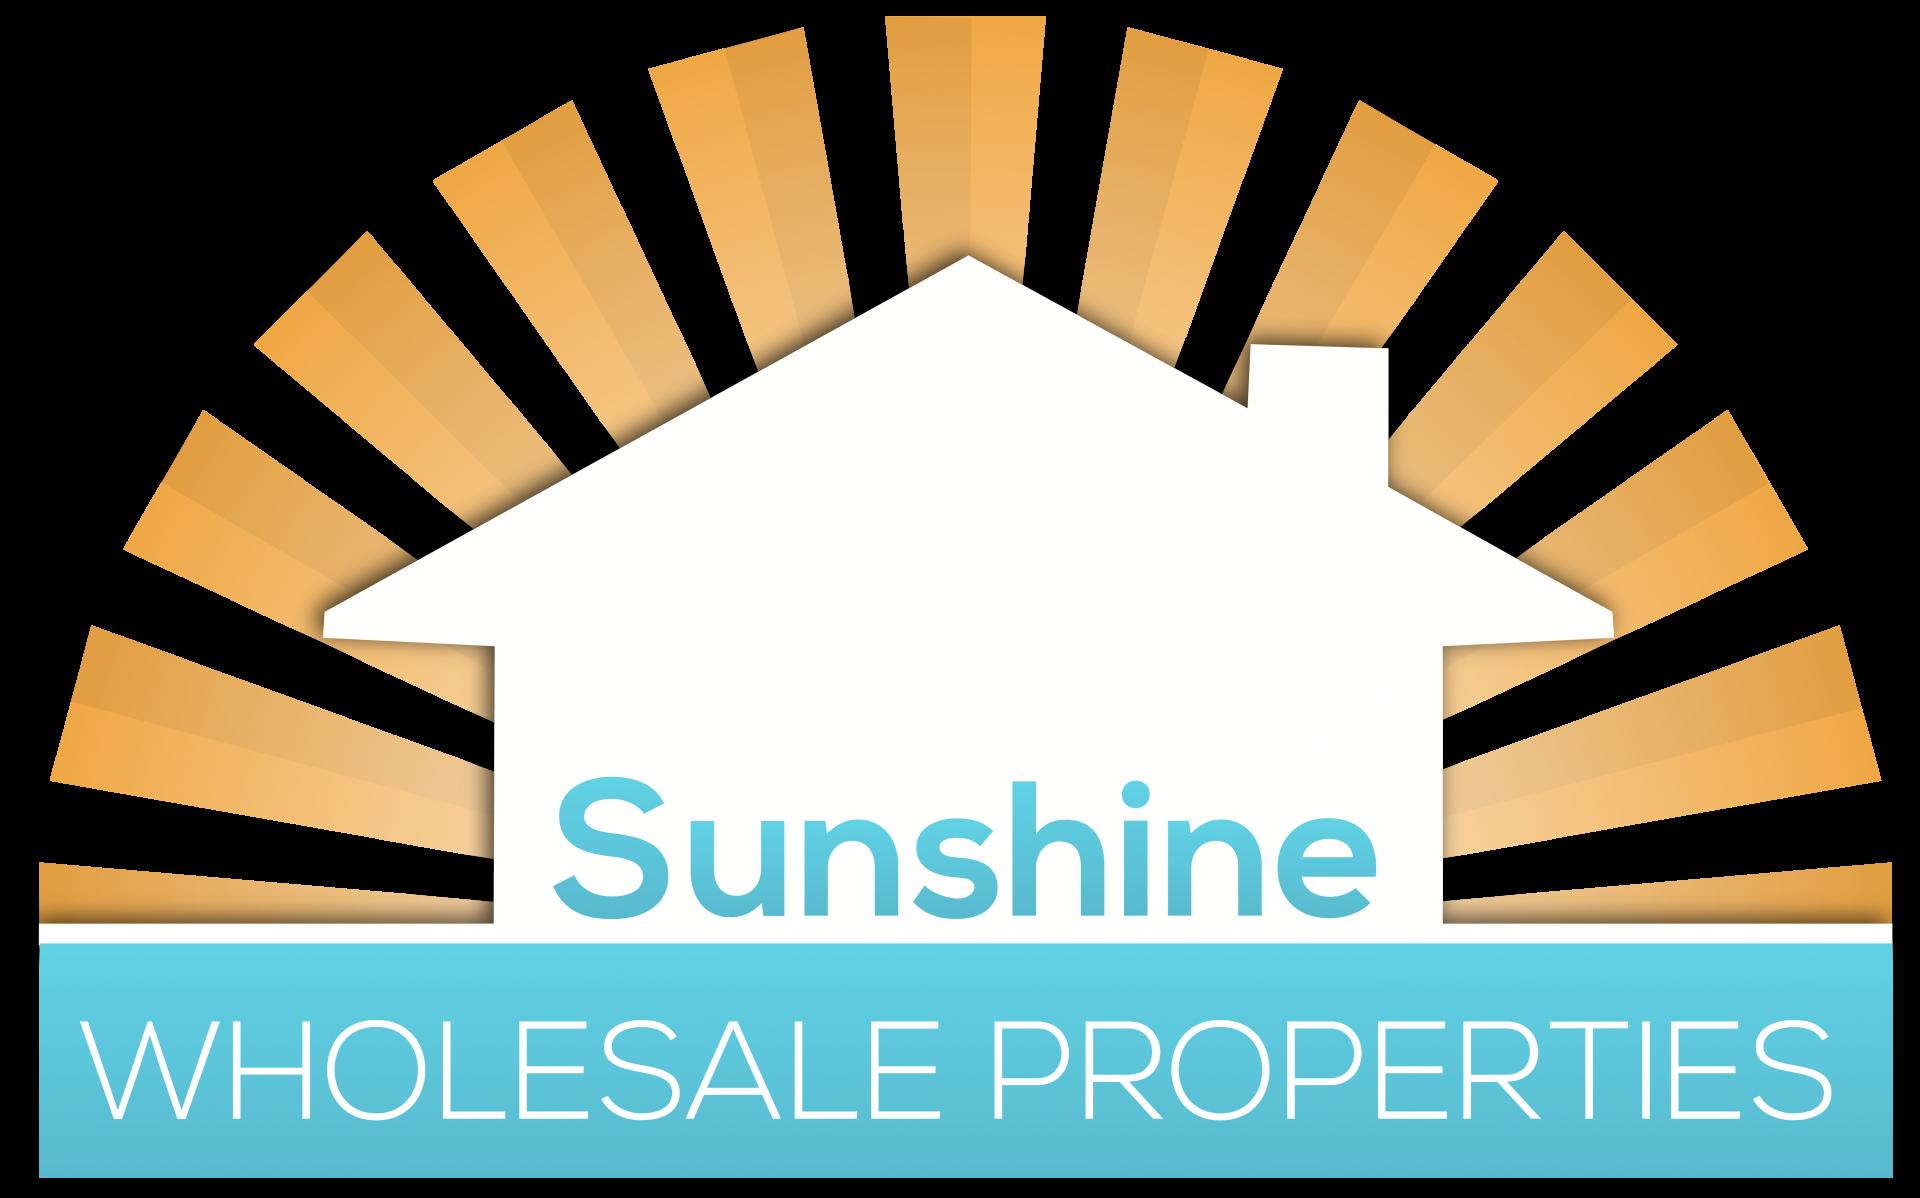 Sunshine Wholesale Properties logo